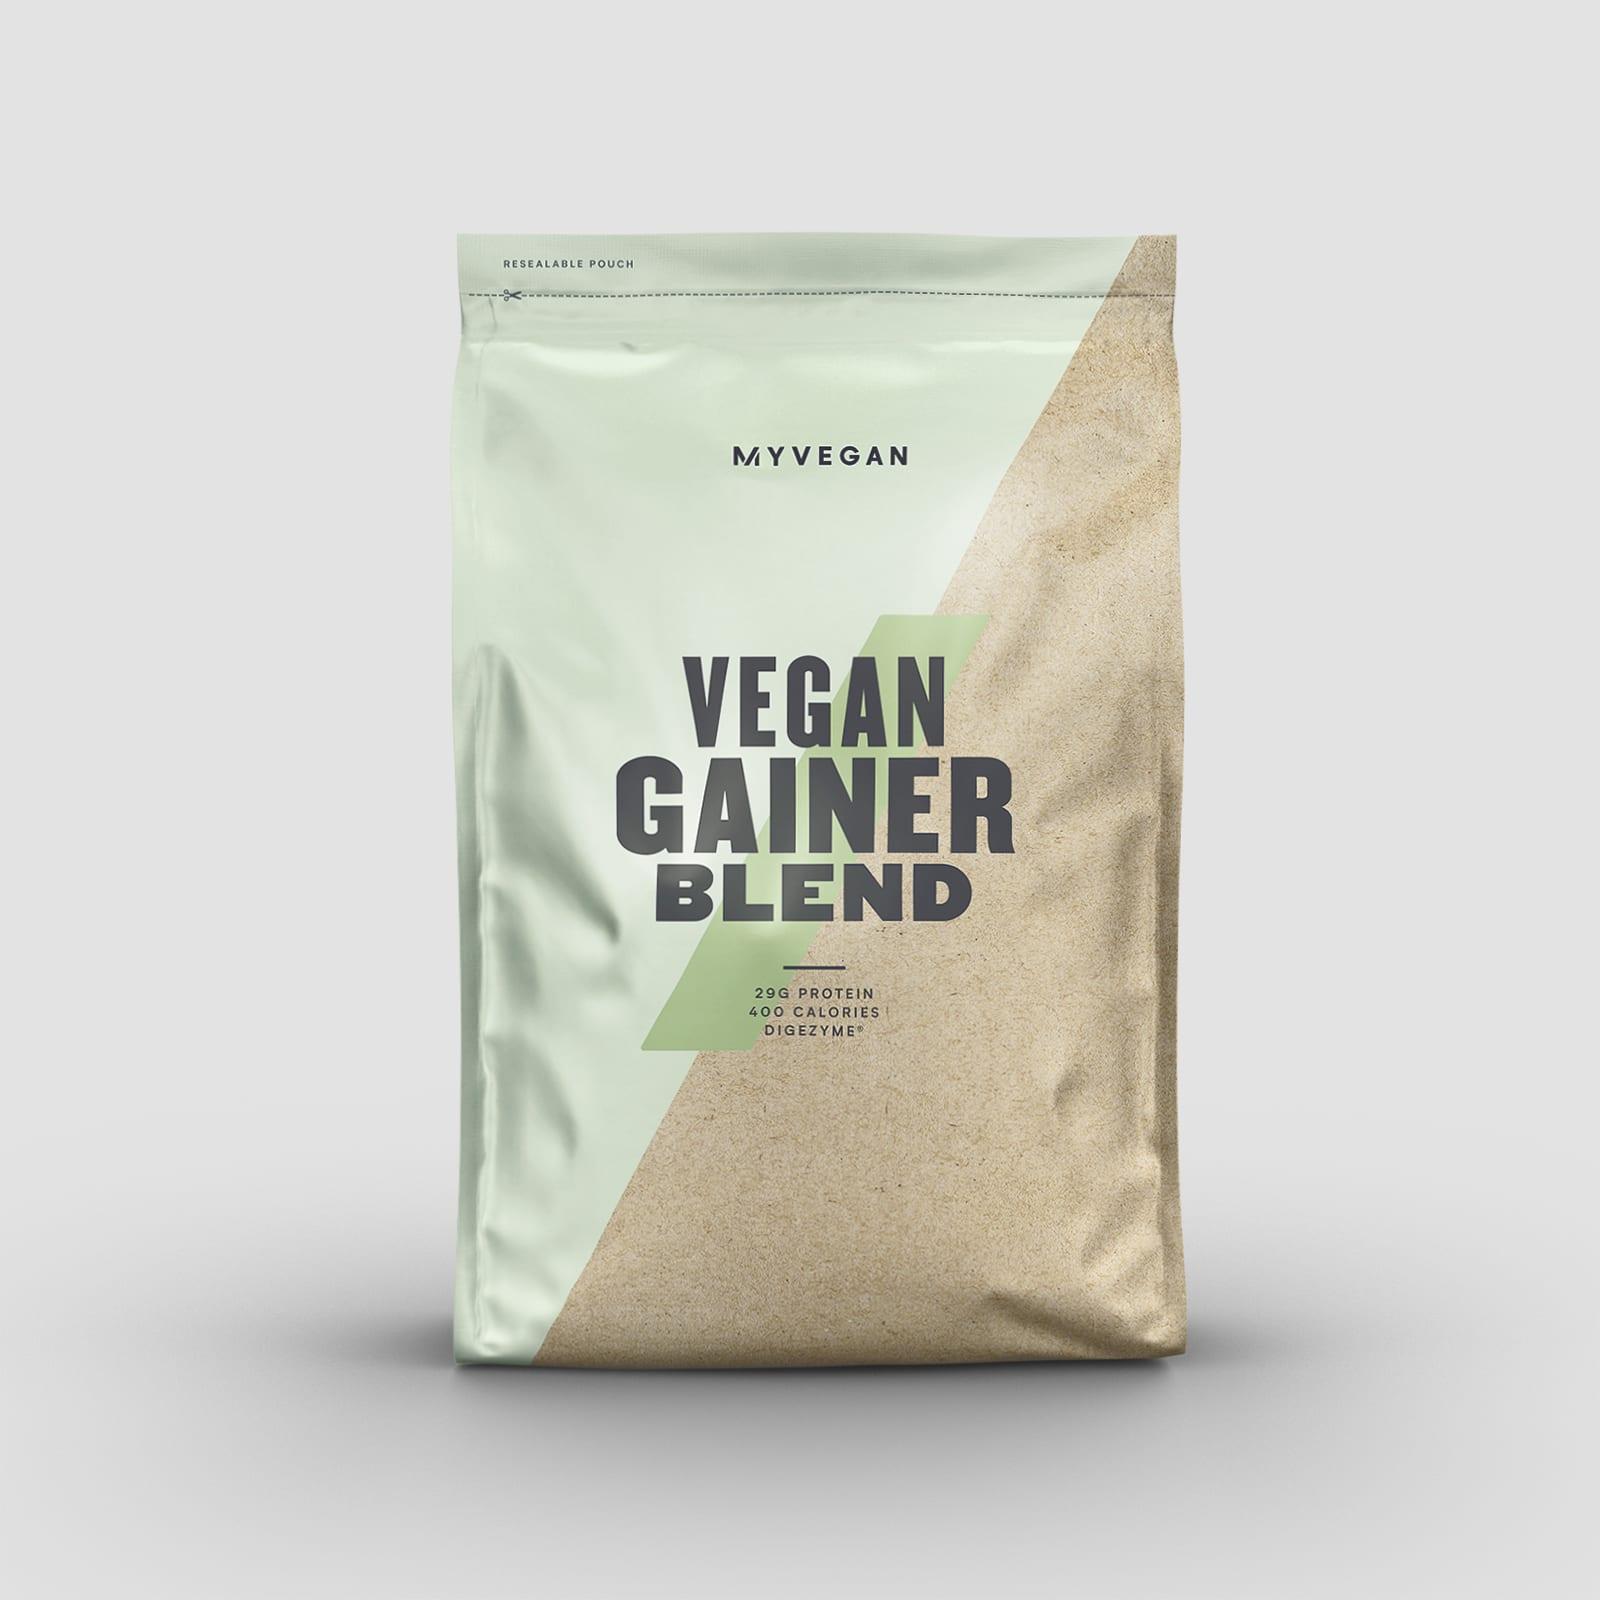 vegan gainer blend